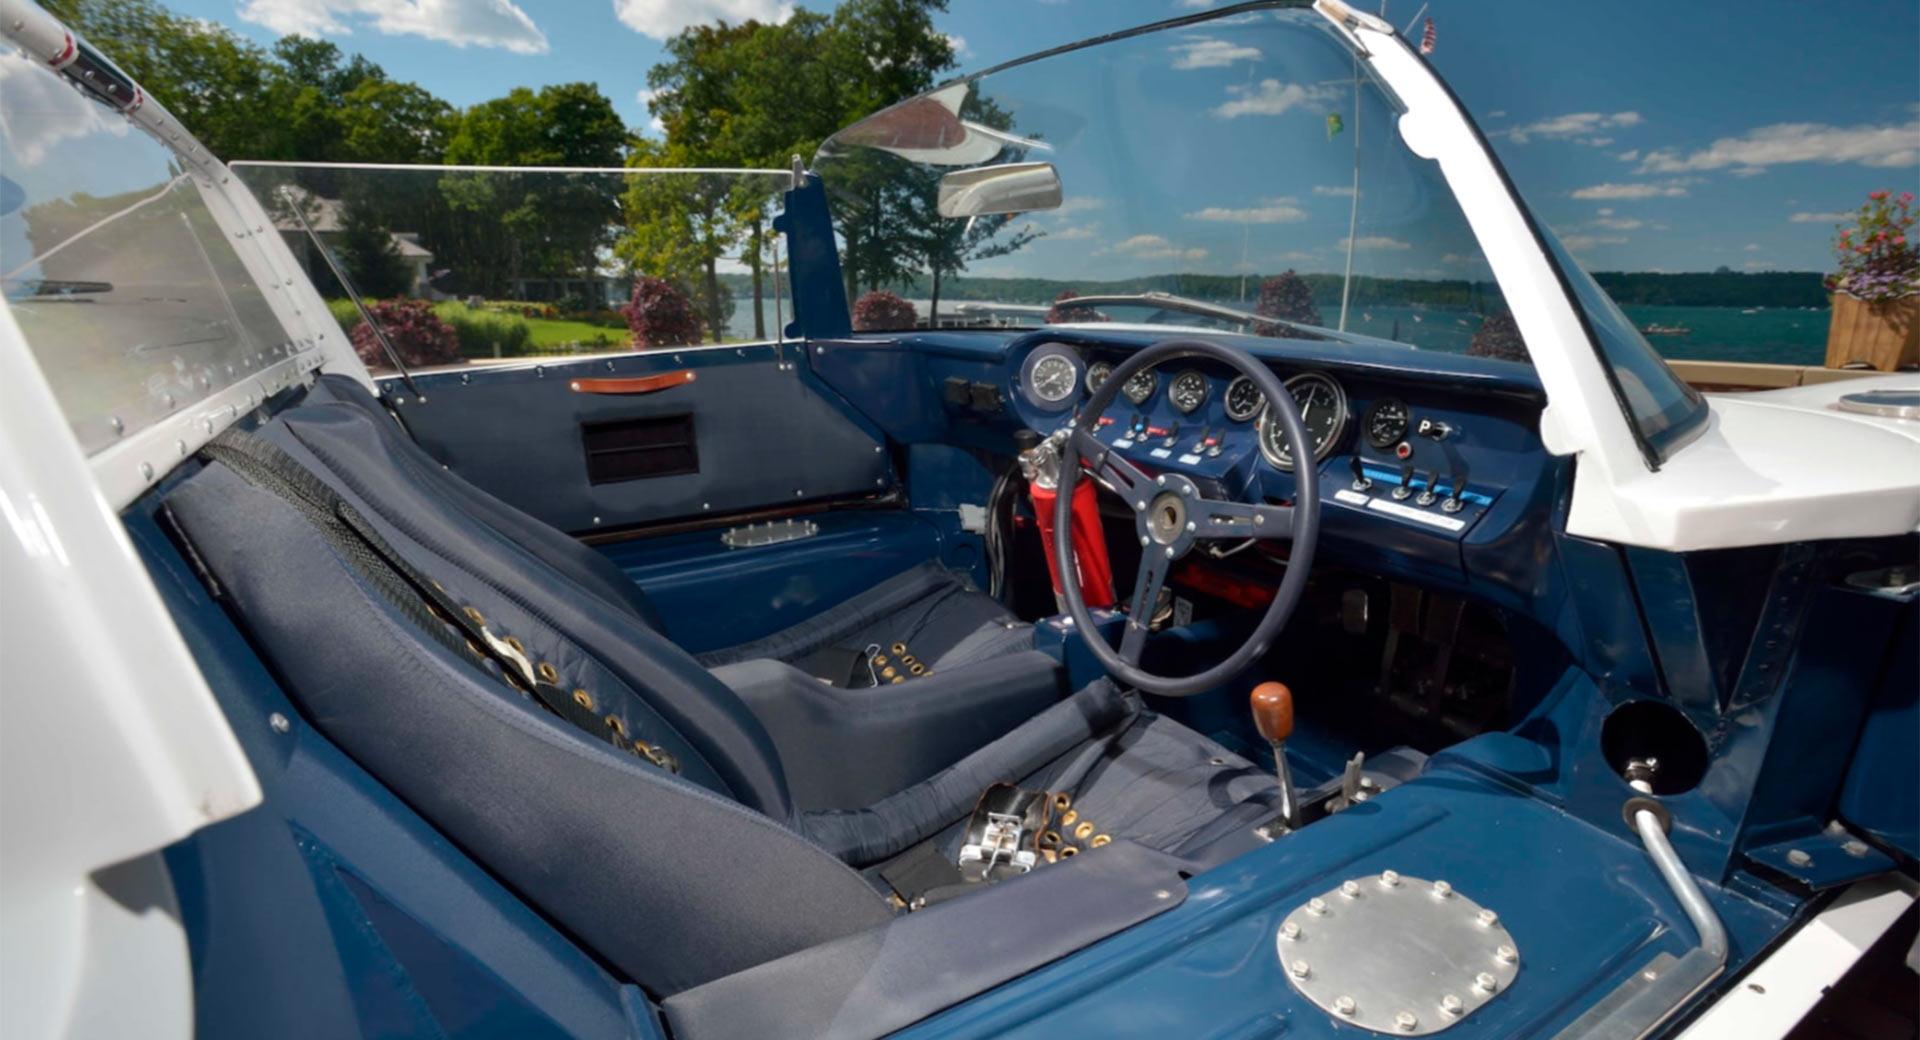 Старый 50-летний Ford продают по цене трех Bugatti Chiron - Обзор